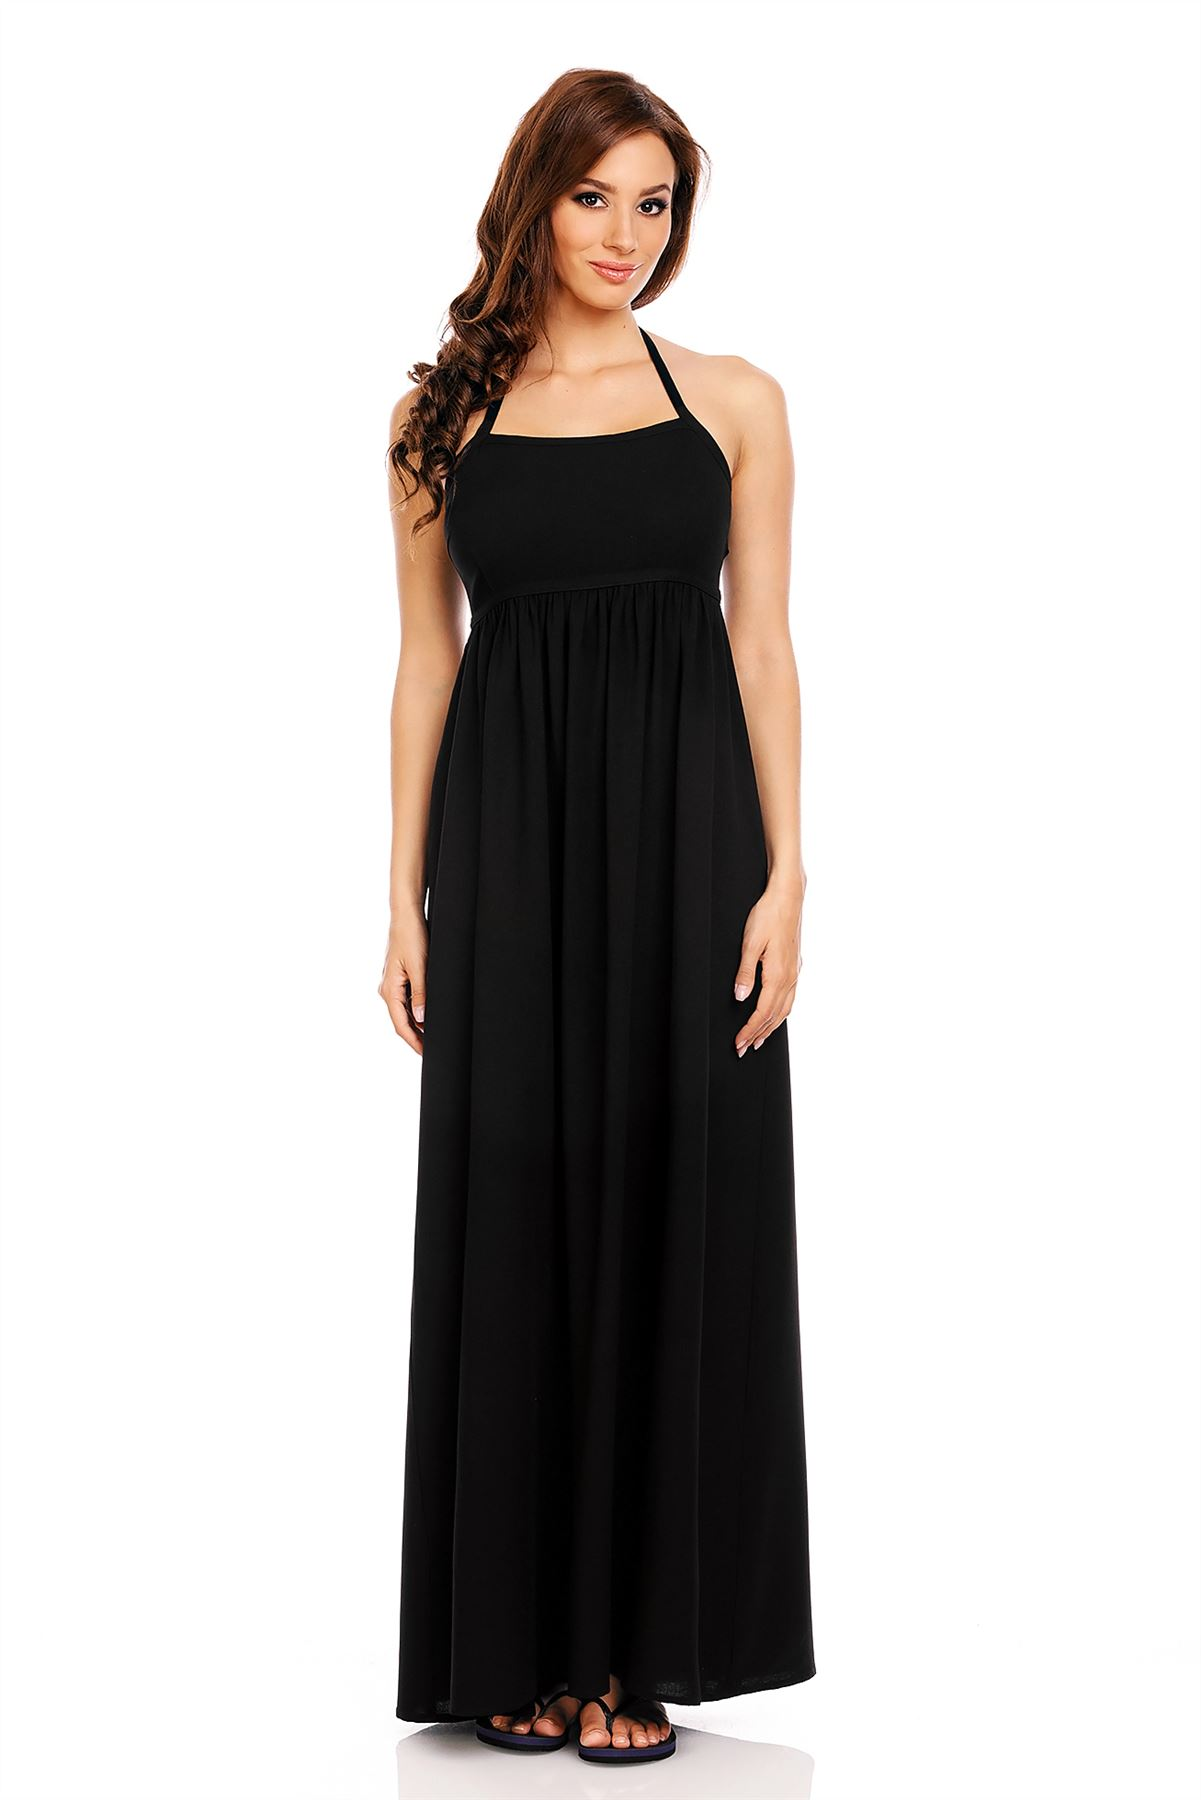 103899c2523 Plus Size Long Dresses Uk - Data Dynamic AG